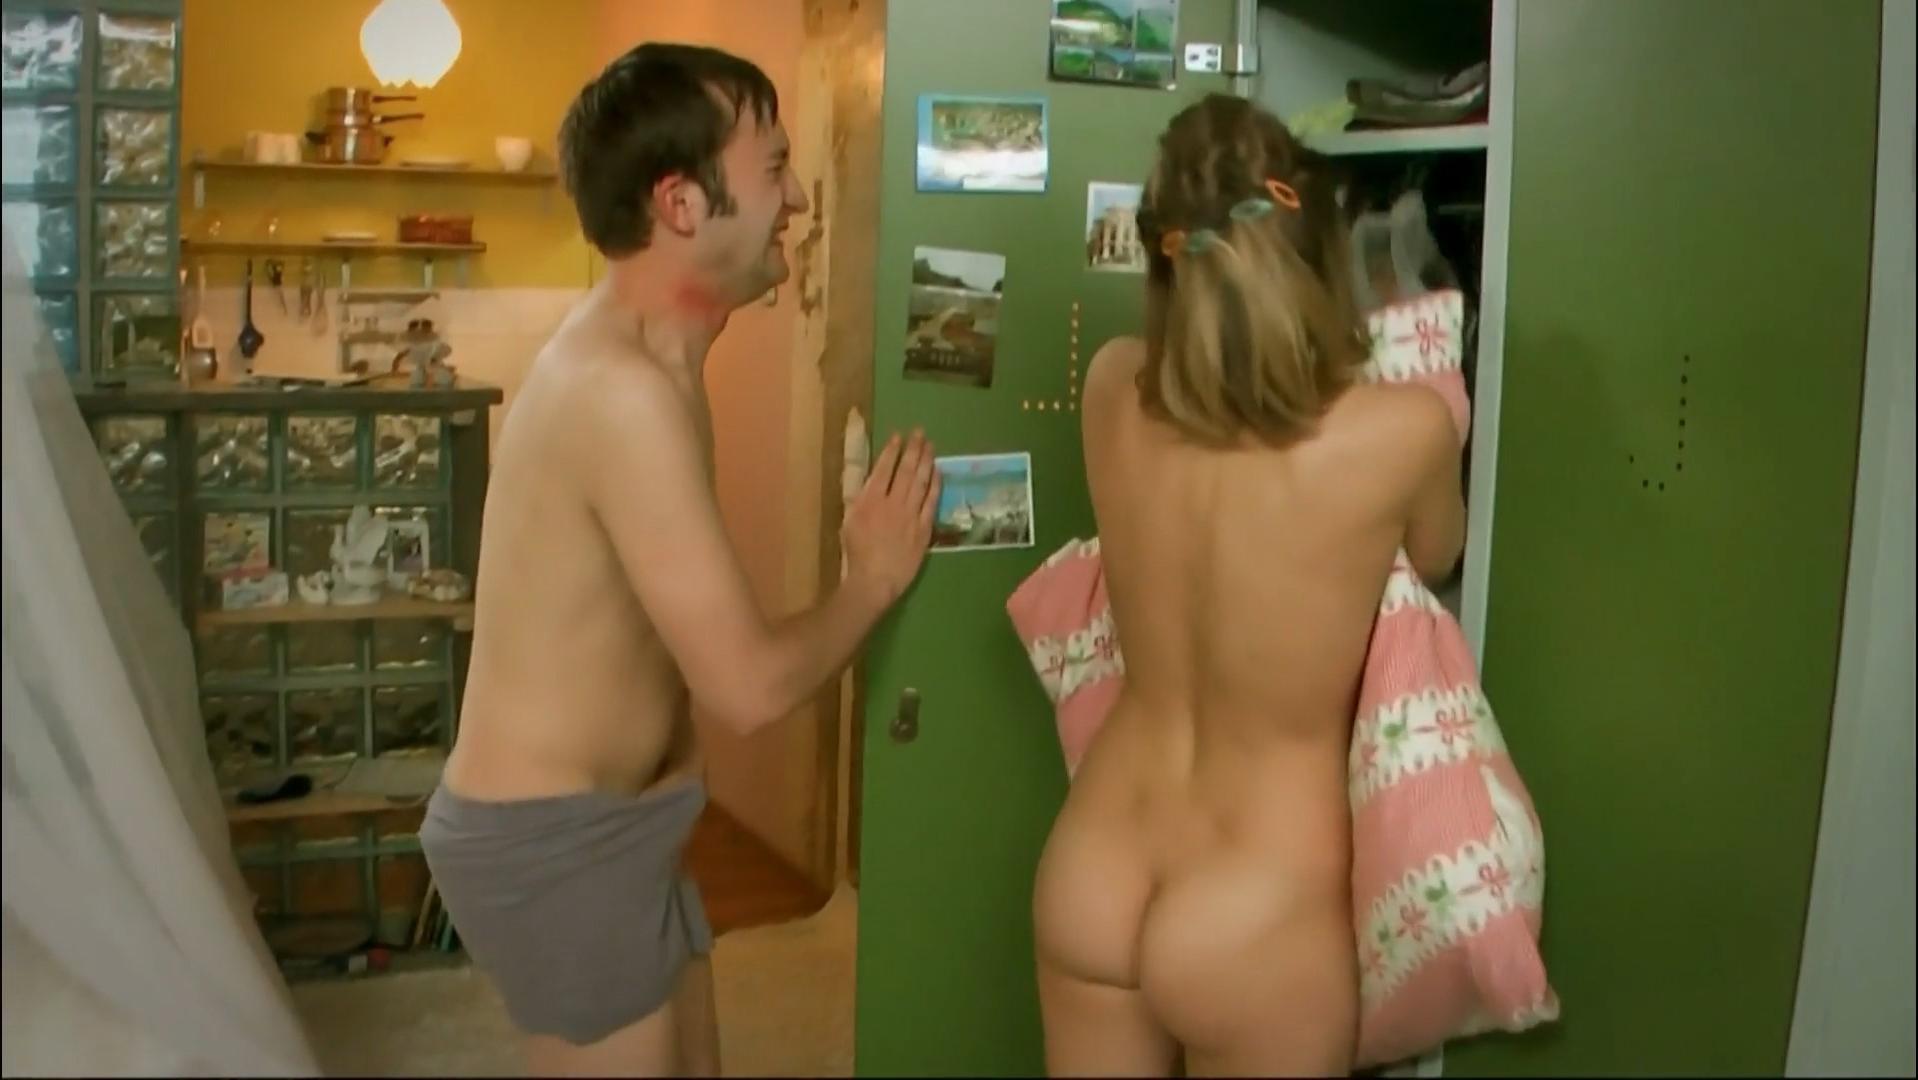 Jule Bowe nude, Doris Schefer nude, Jytte-Merle Boehrnsen nude - Dating Lanzelot (2011)